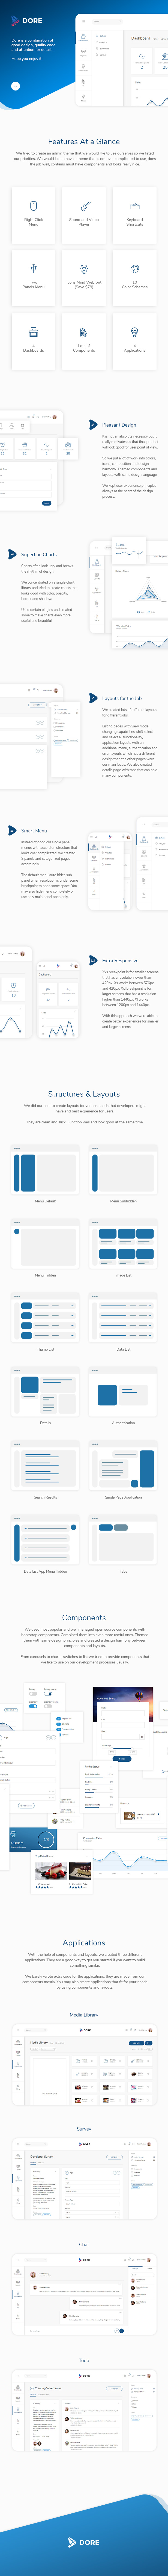 Dore jQuery - Bootstrap 4 Admin Template - 3